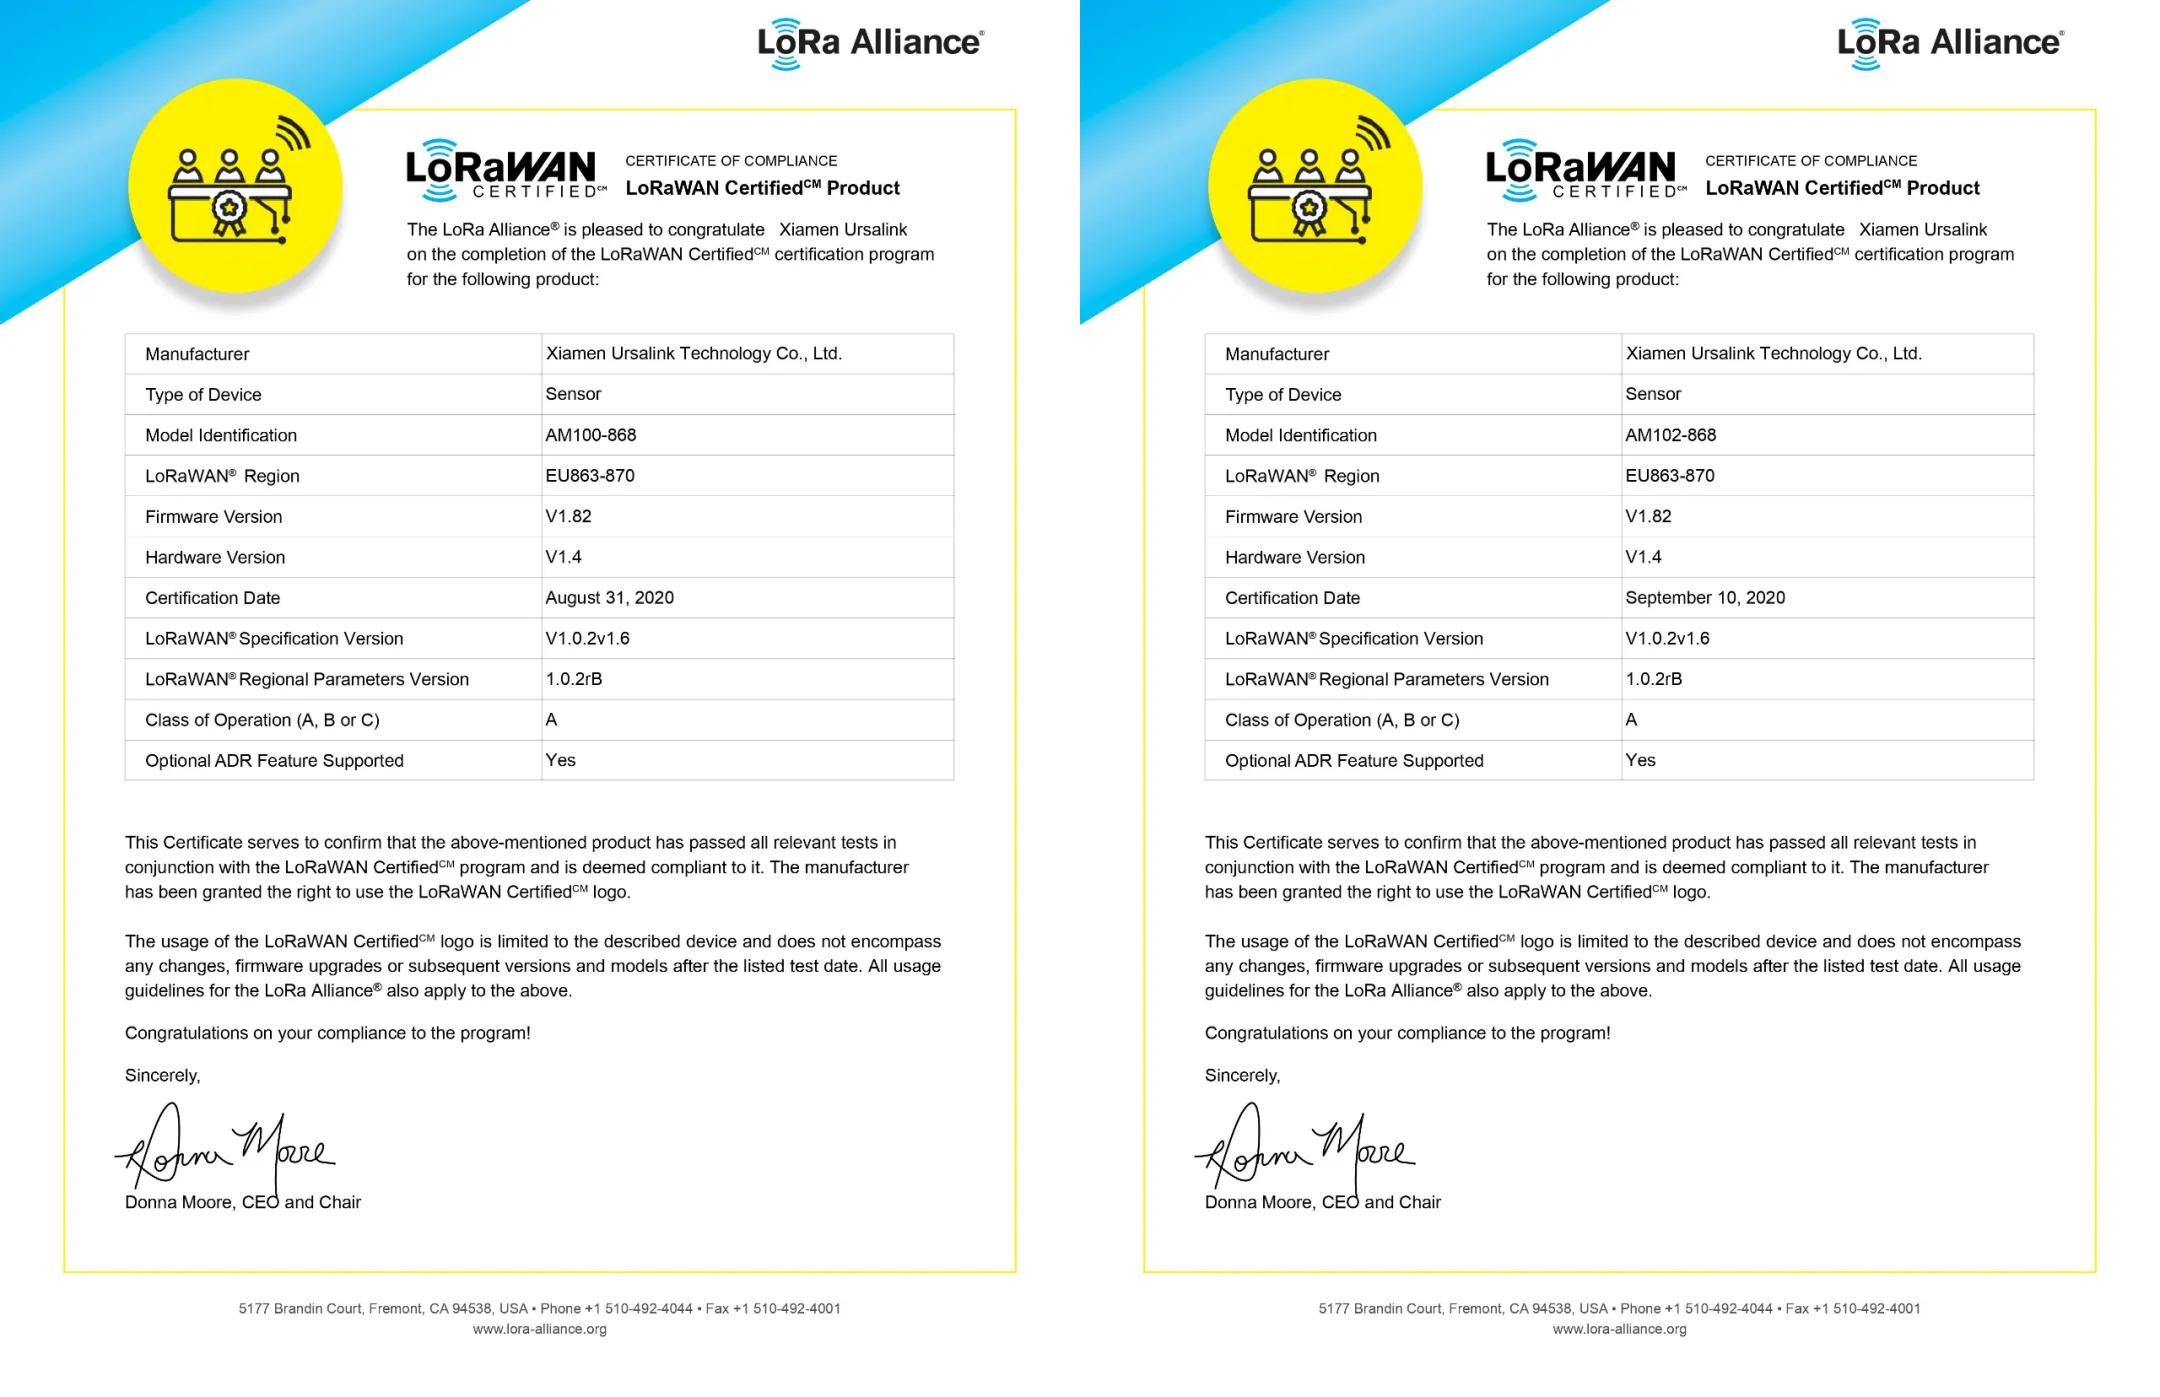 lorawan-certified-products-AM